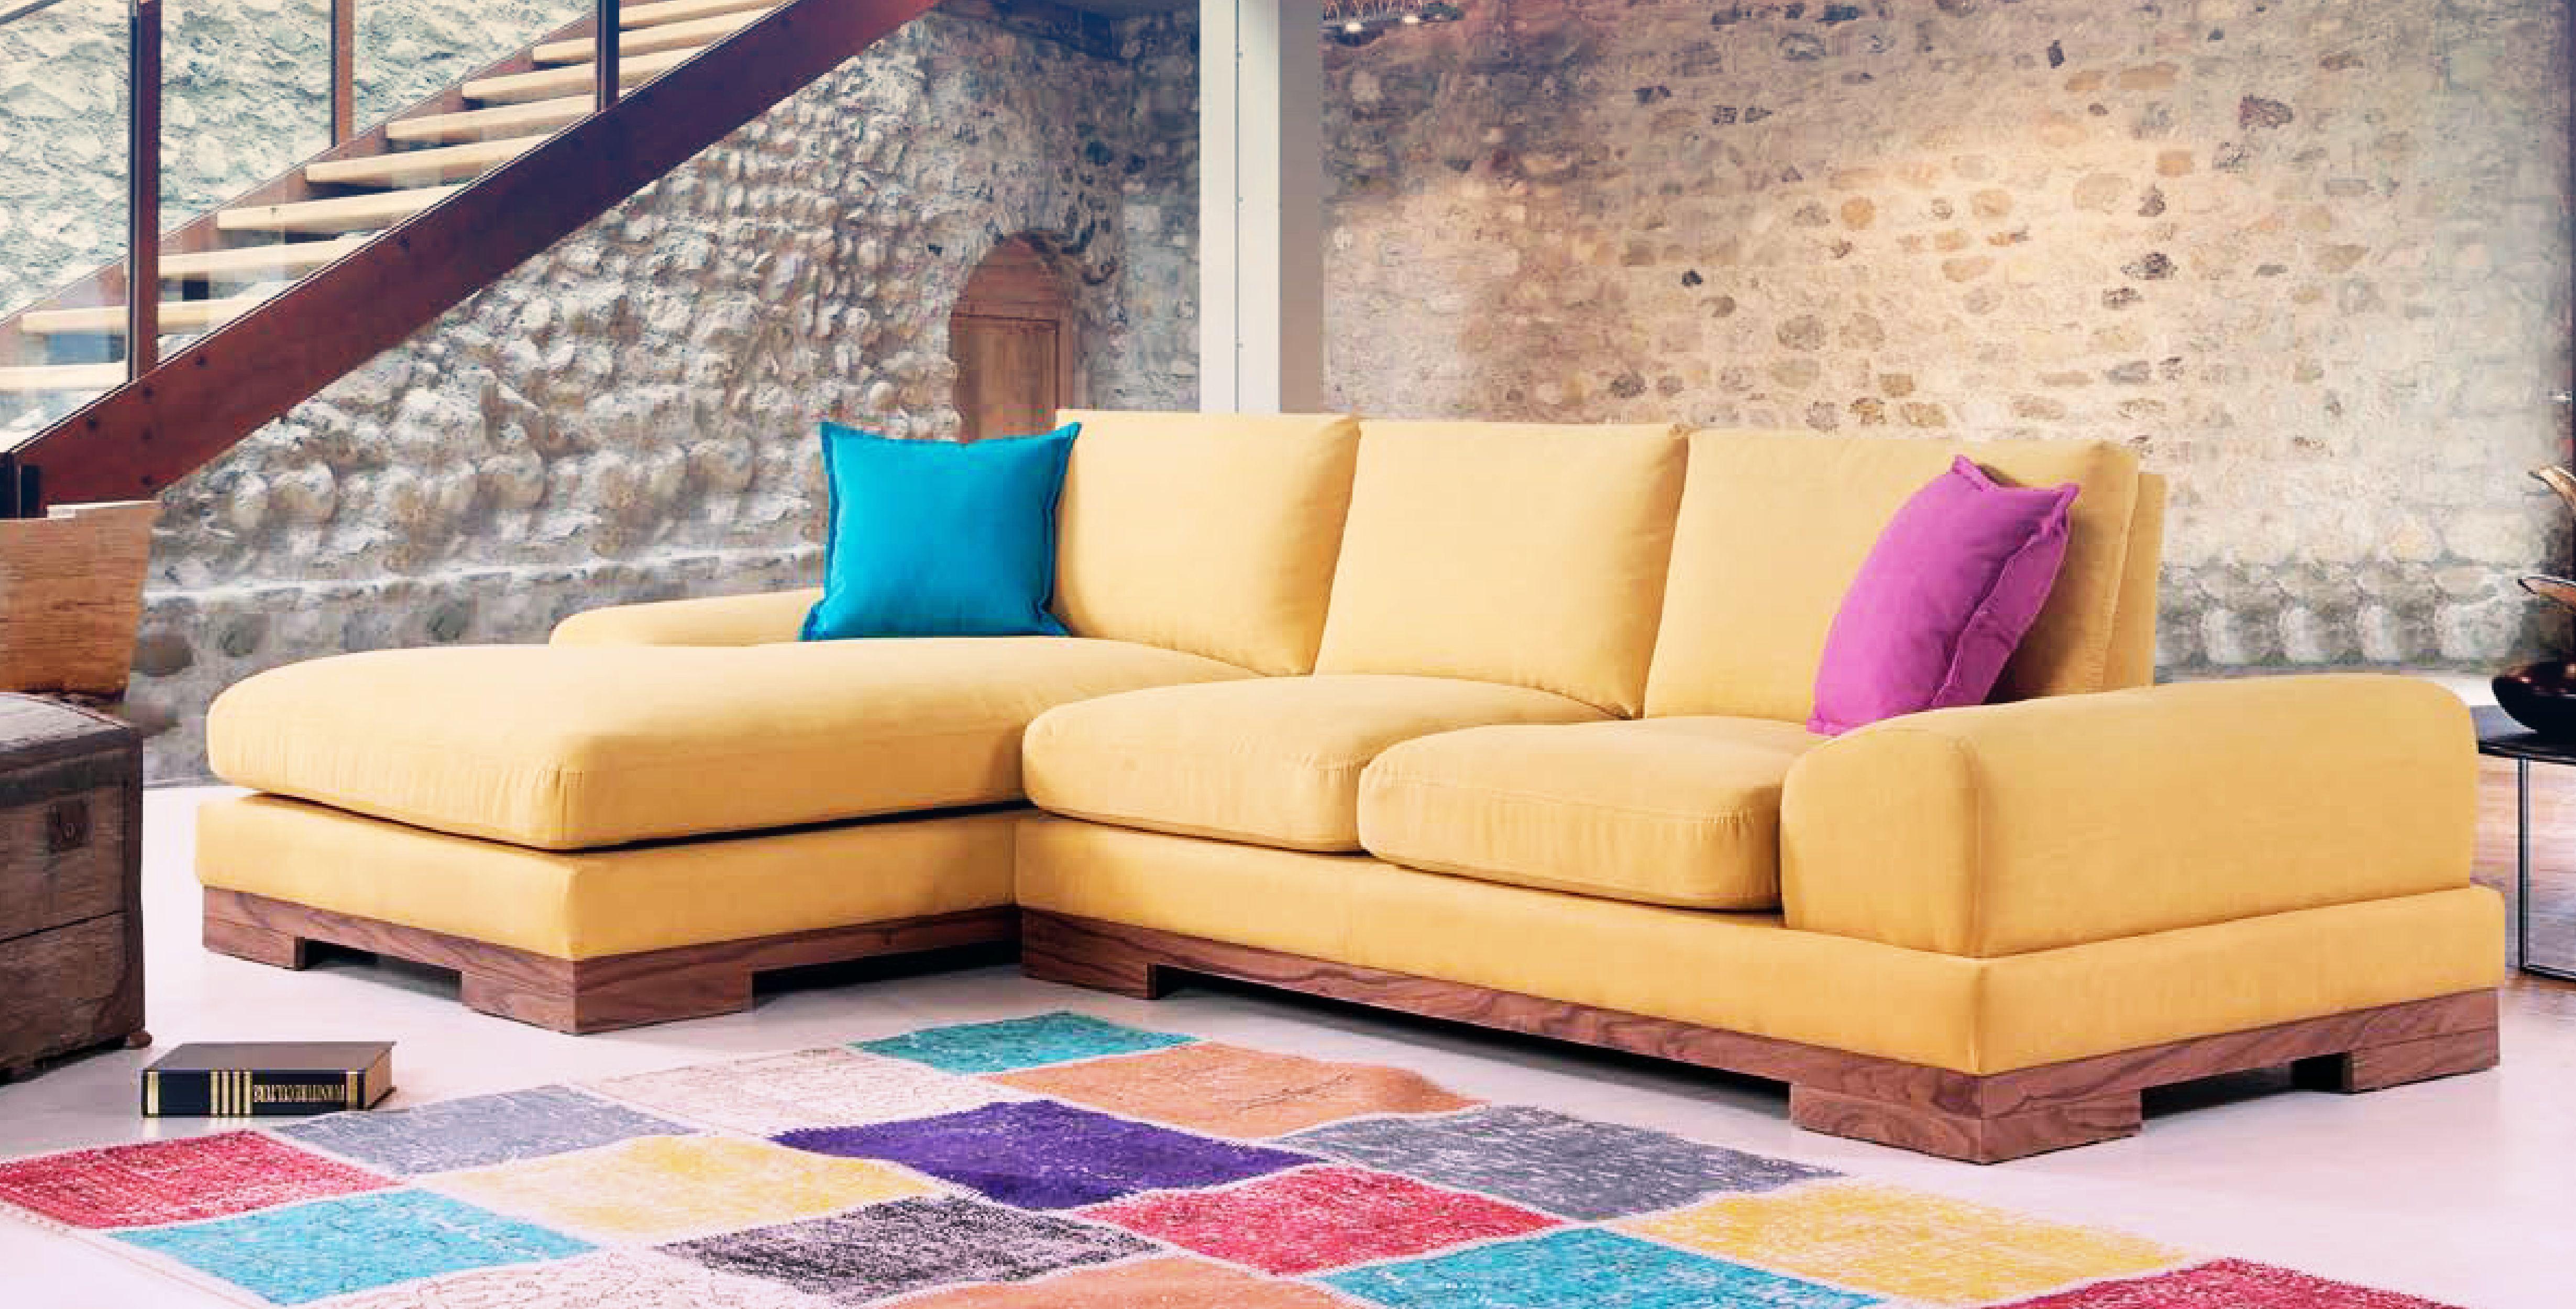 Palma Kose Alisveris Istanbul Furniture Dekorasyon Avcilar Koltuk Benimevim Mobilya Mobilya Furniture Koltuklar